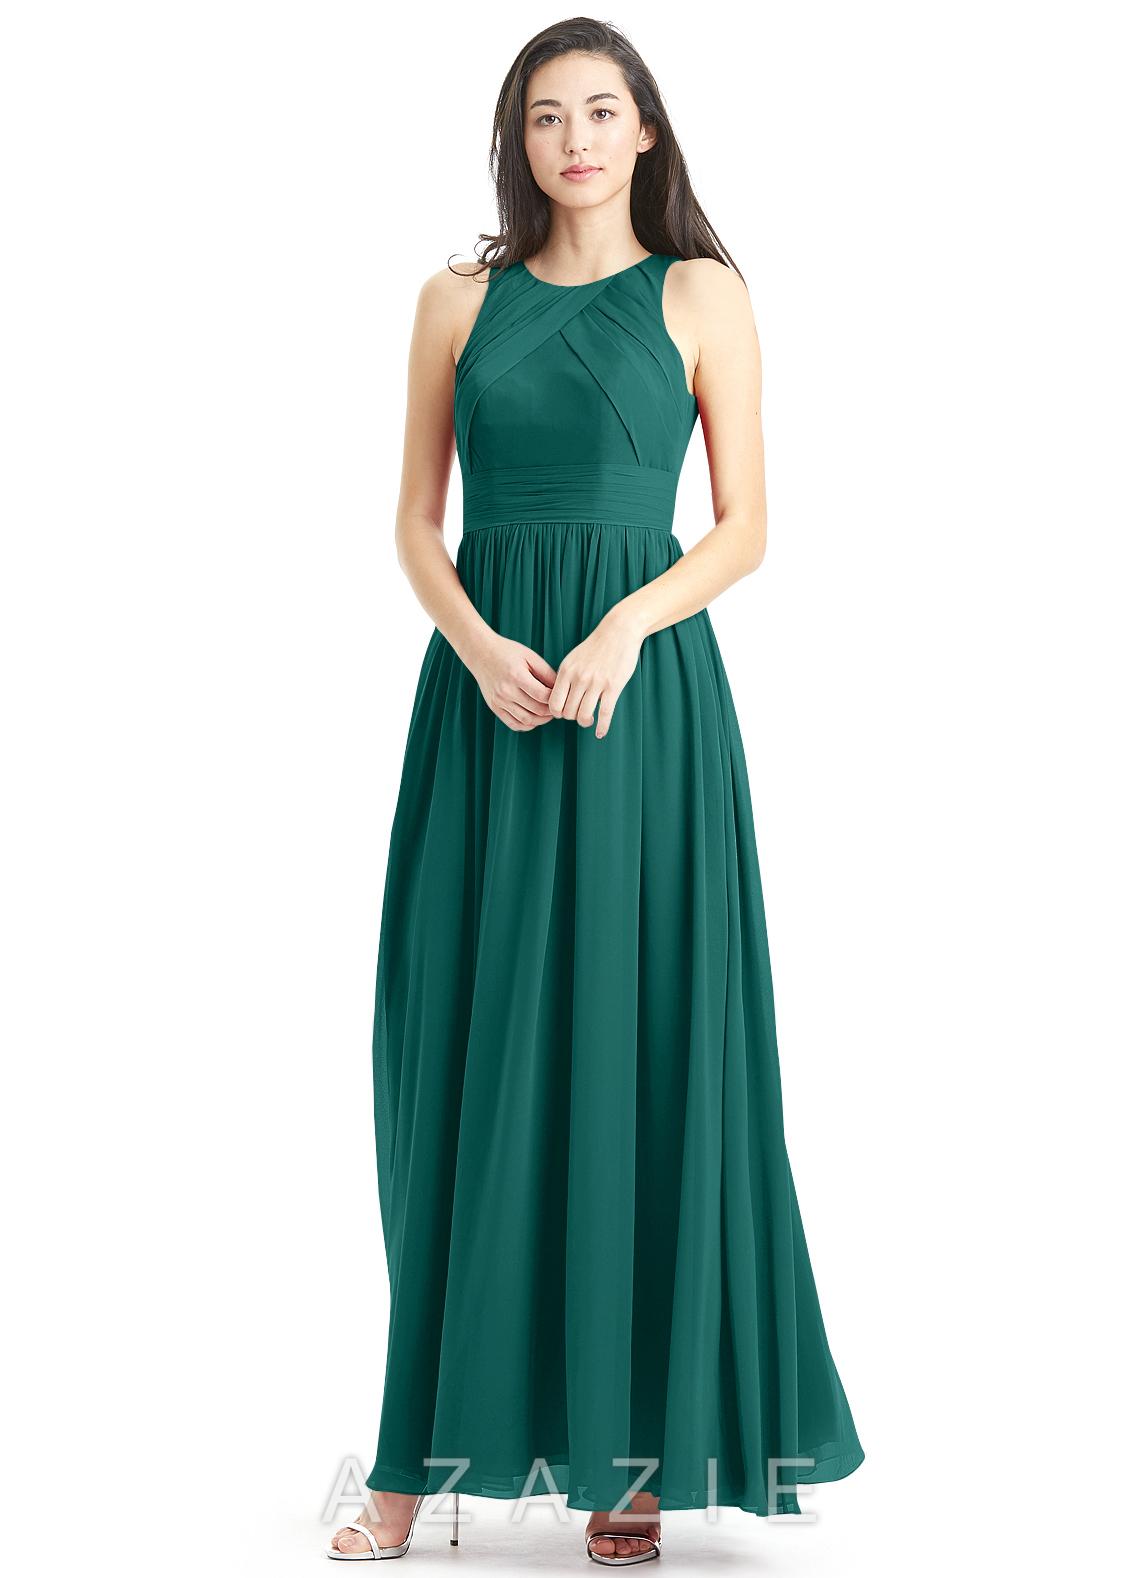 Azazie harper bridesmaid dress azazie loading zoom ombrellifo Images